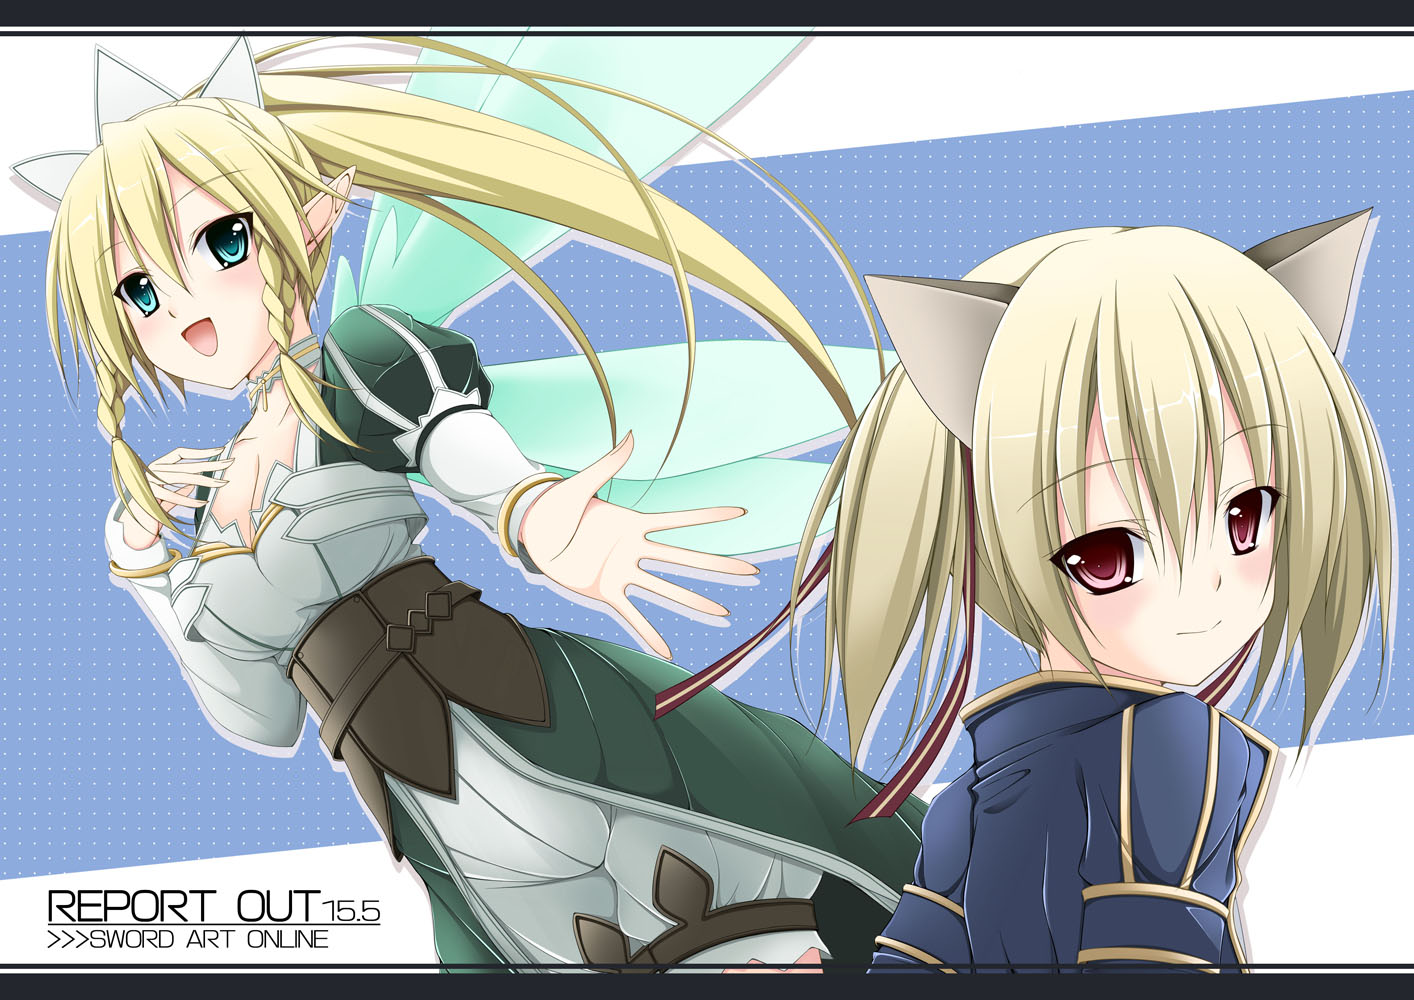 ayano_keiko jpeg_artifacts leafa pointed_ears sword_art_online tagme